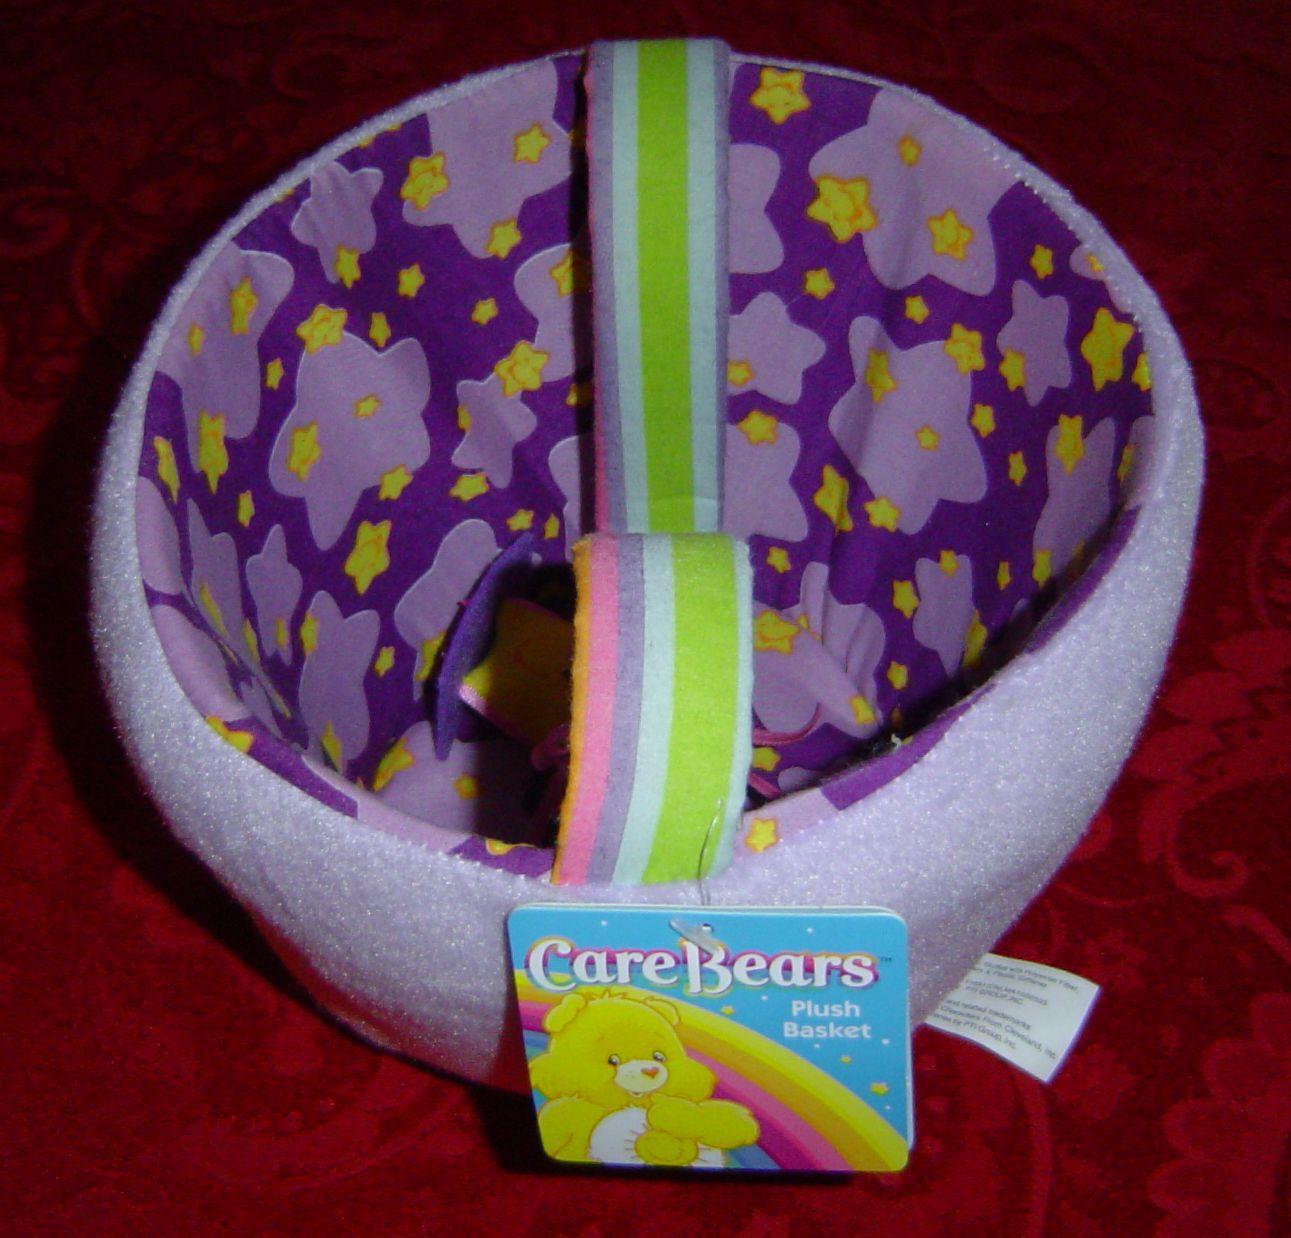 Care Bears Plush Easter Basket Spring Basket Star friend swings from handle